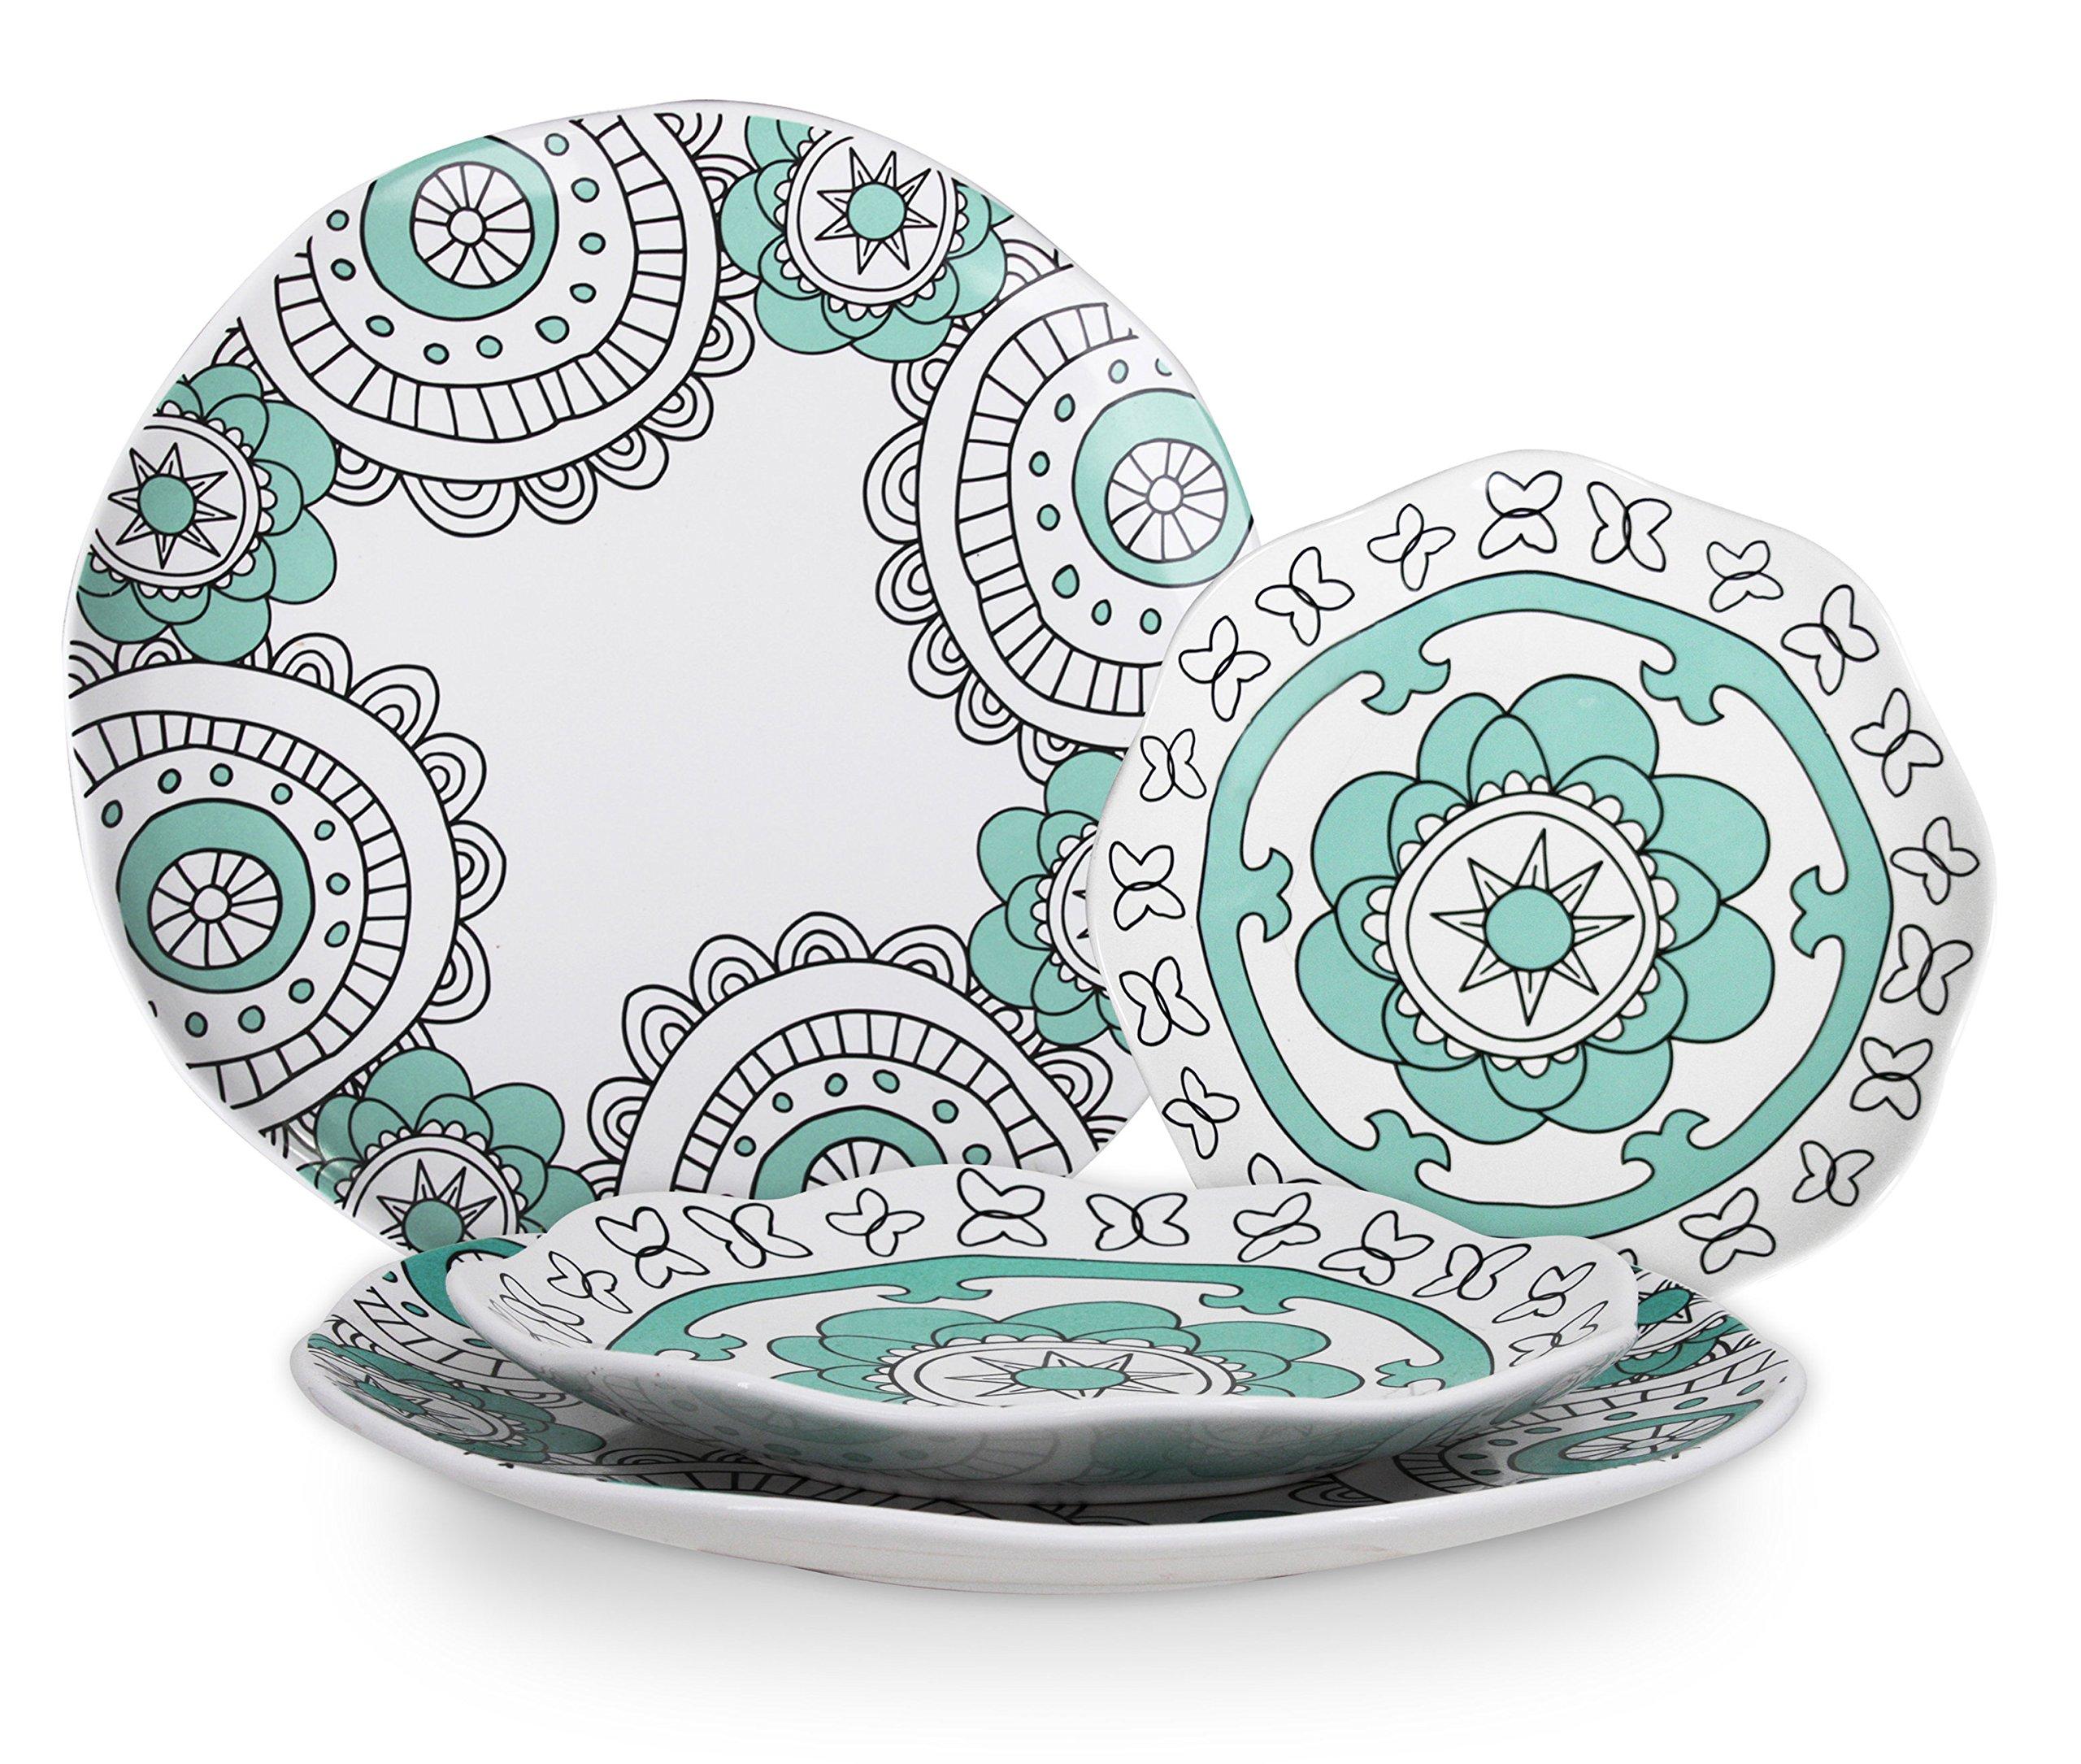 Dinner Plates Appetizer Salad Plate Set 4, Porcelain Mint Blue, Floral Pattern, Accent Serving Plates